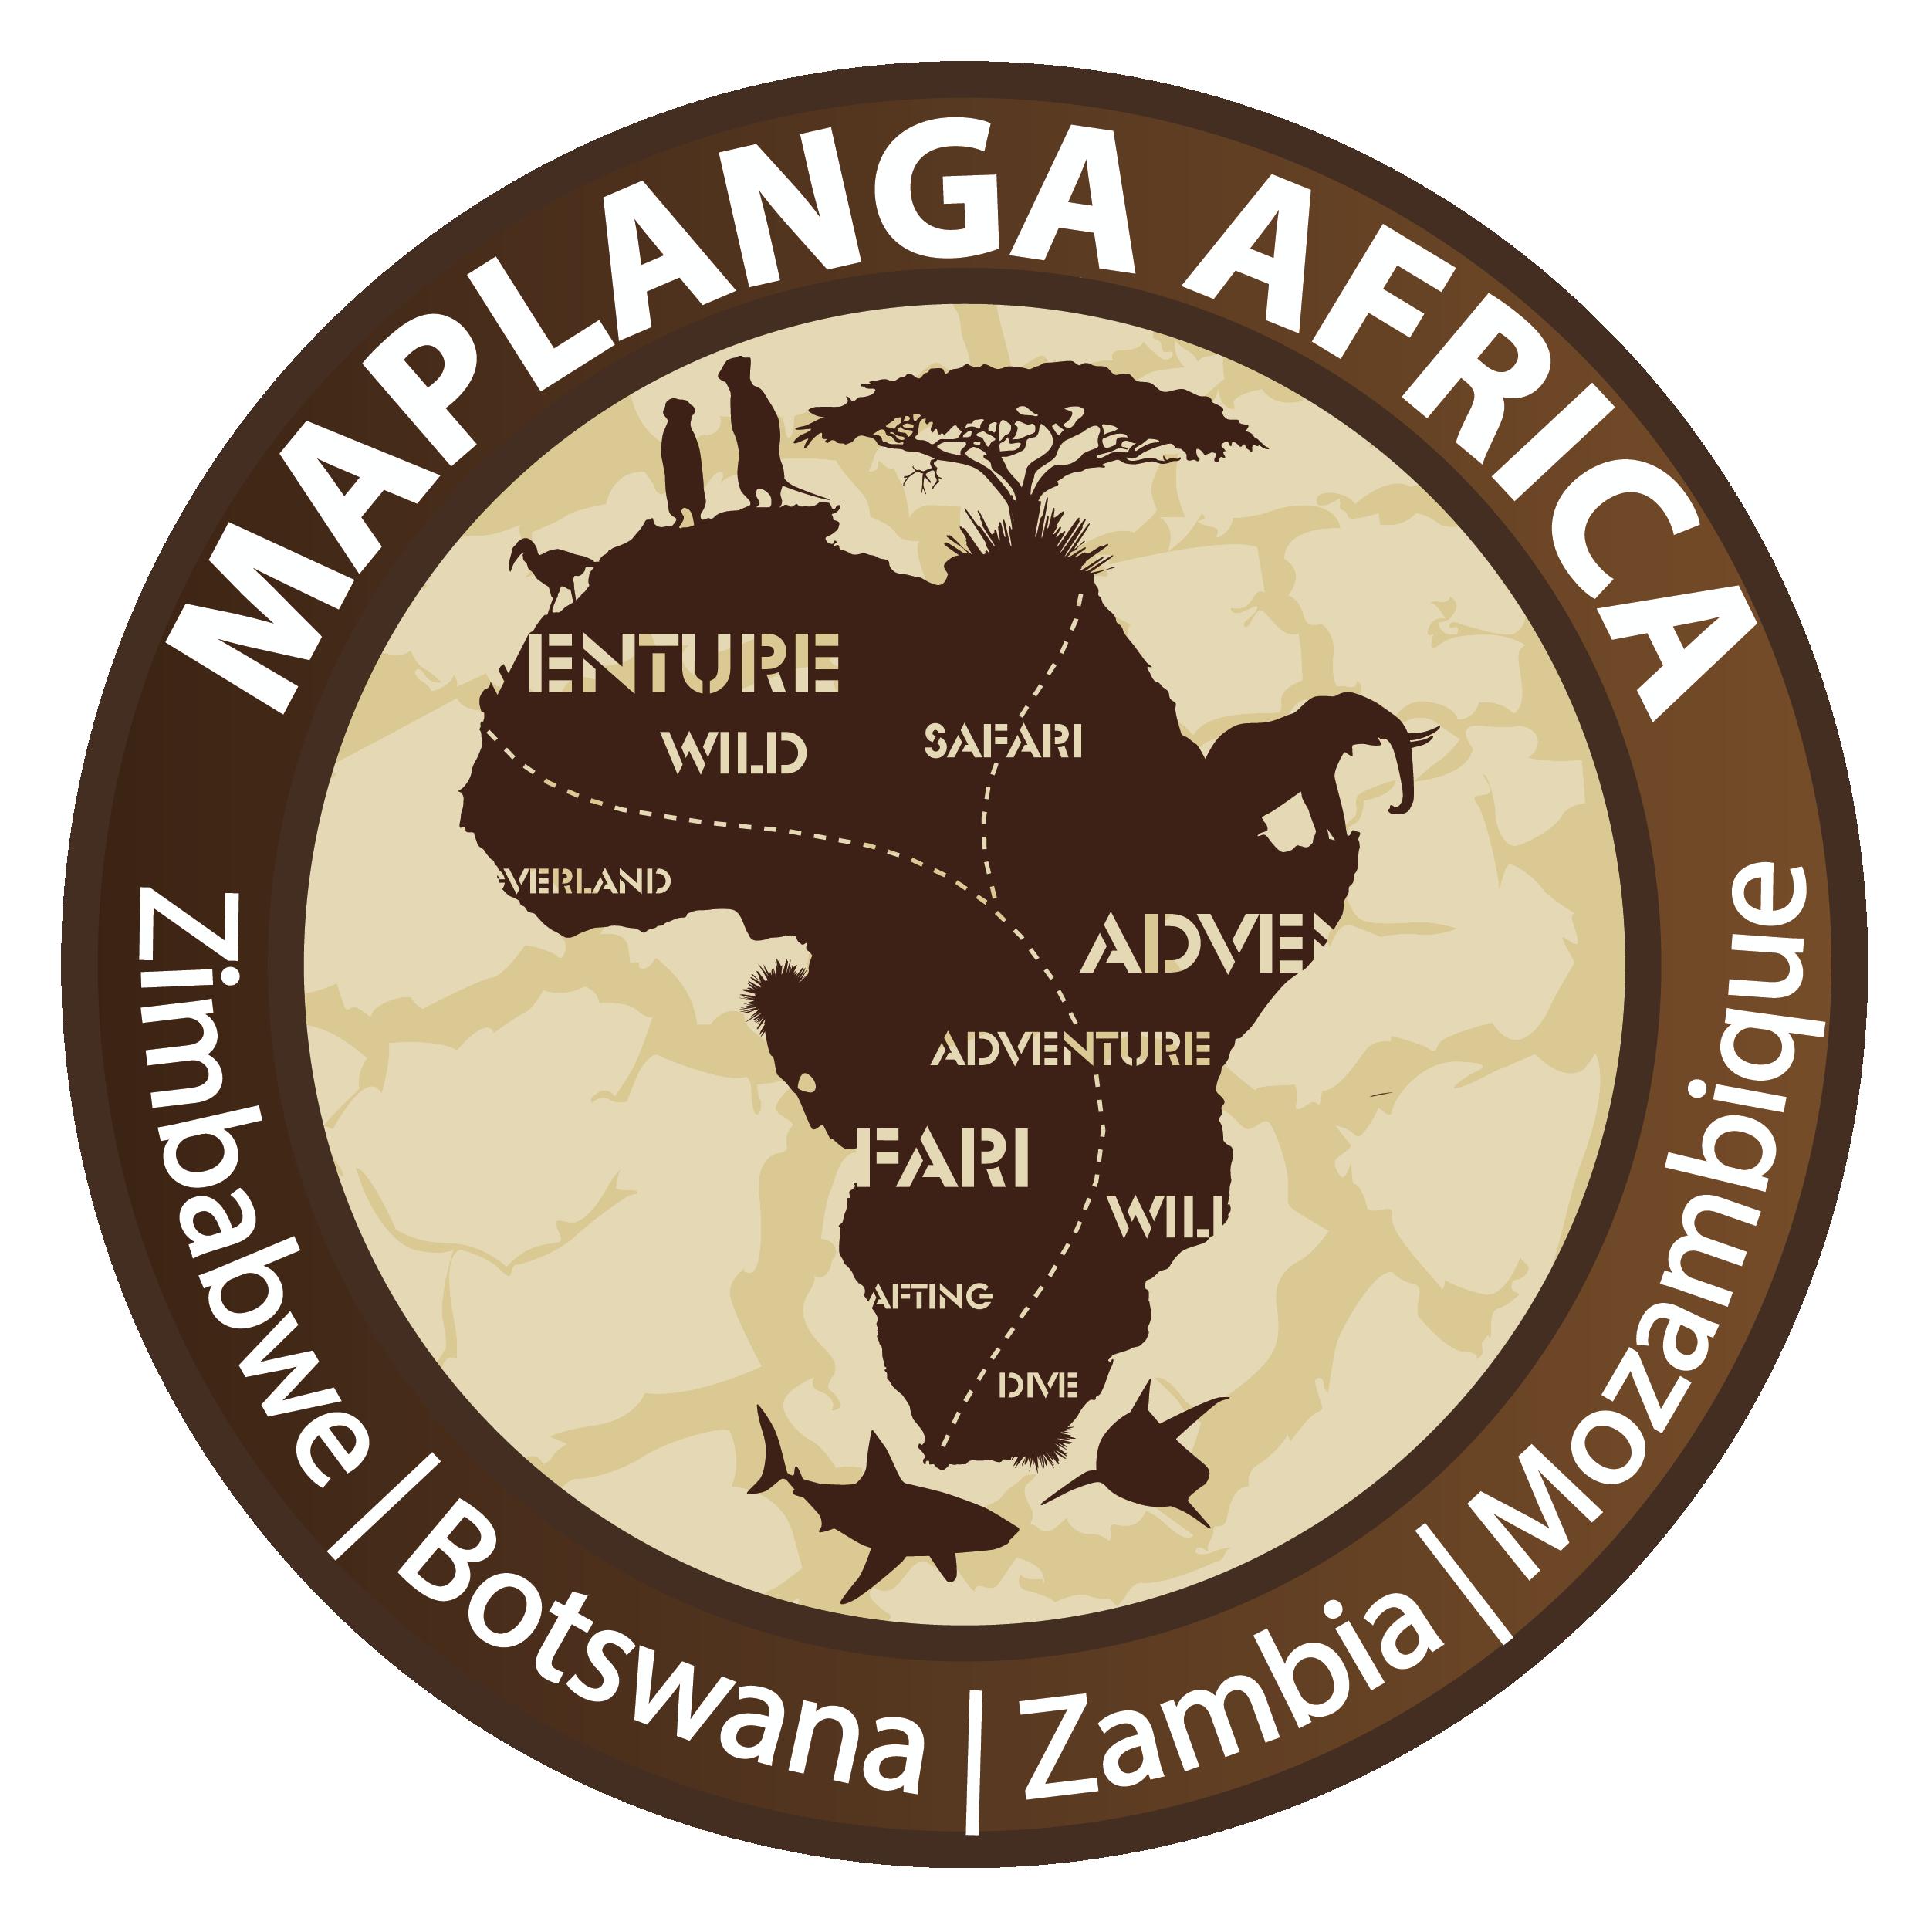 Maplanga Africa